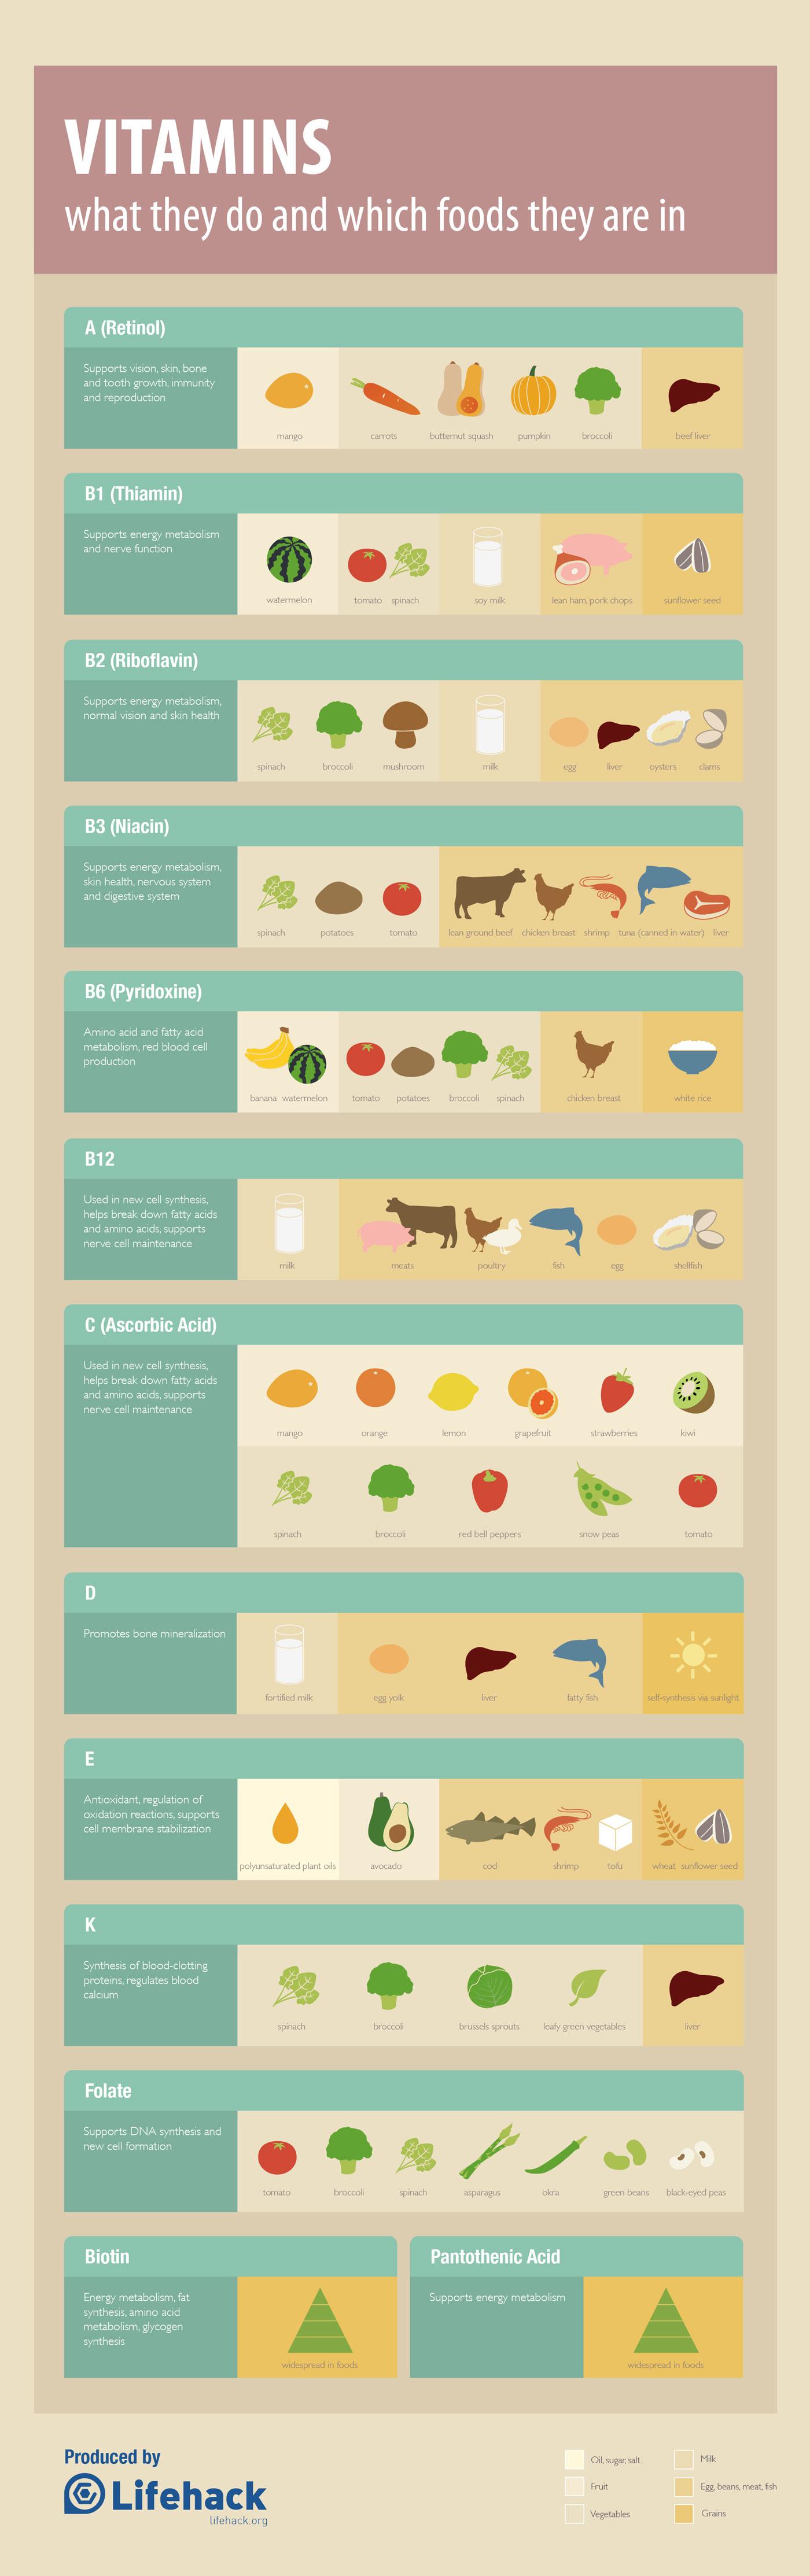 Vitamins-Cheat-Sheet-Infographic.jpg 1,400×4,455 pixels